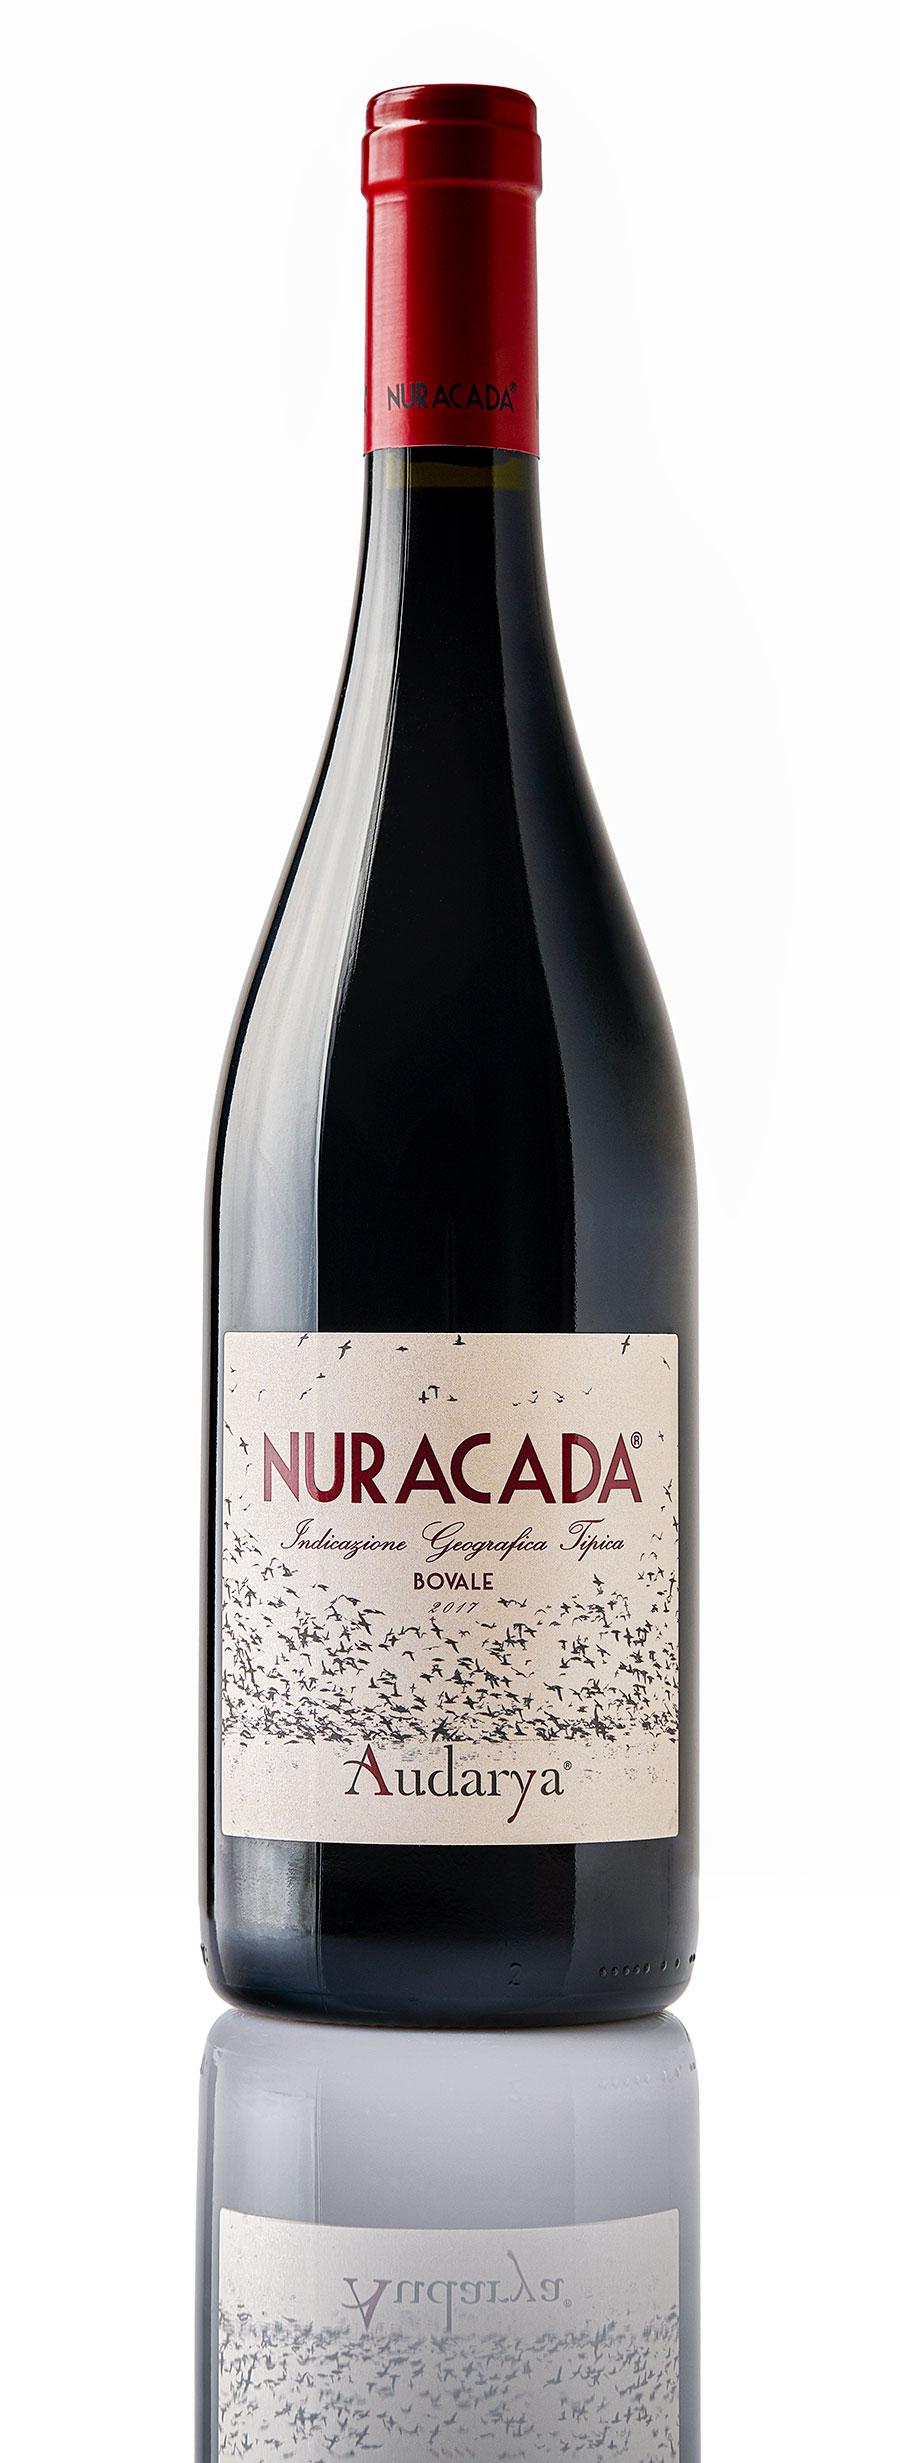 Audarya - Viticoltori in Sardegna - Nuracada - IGT Bovale